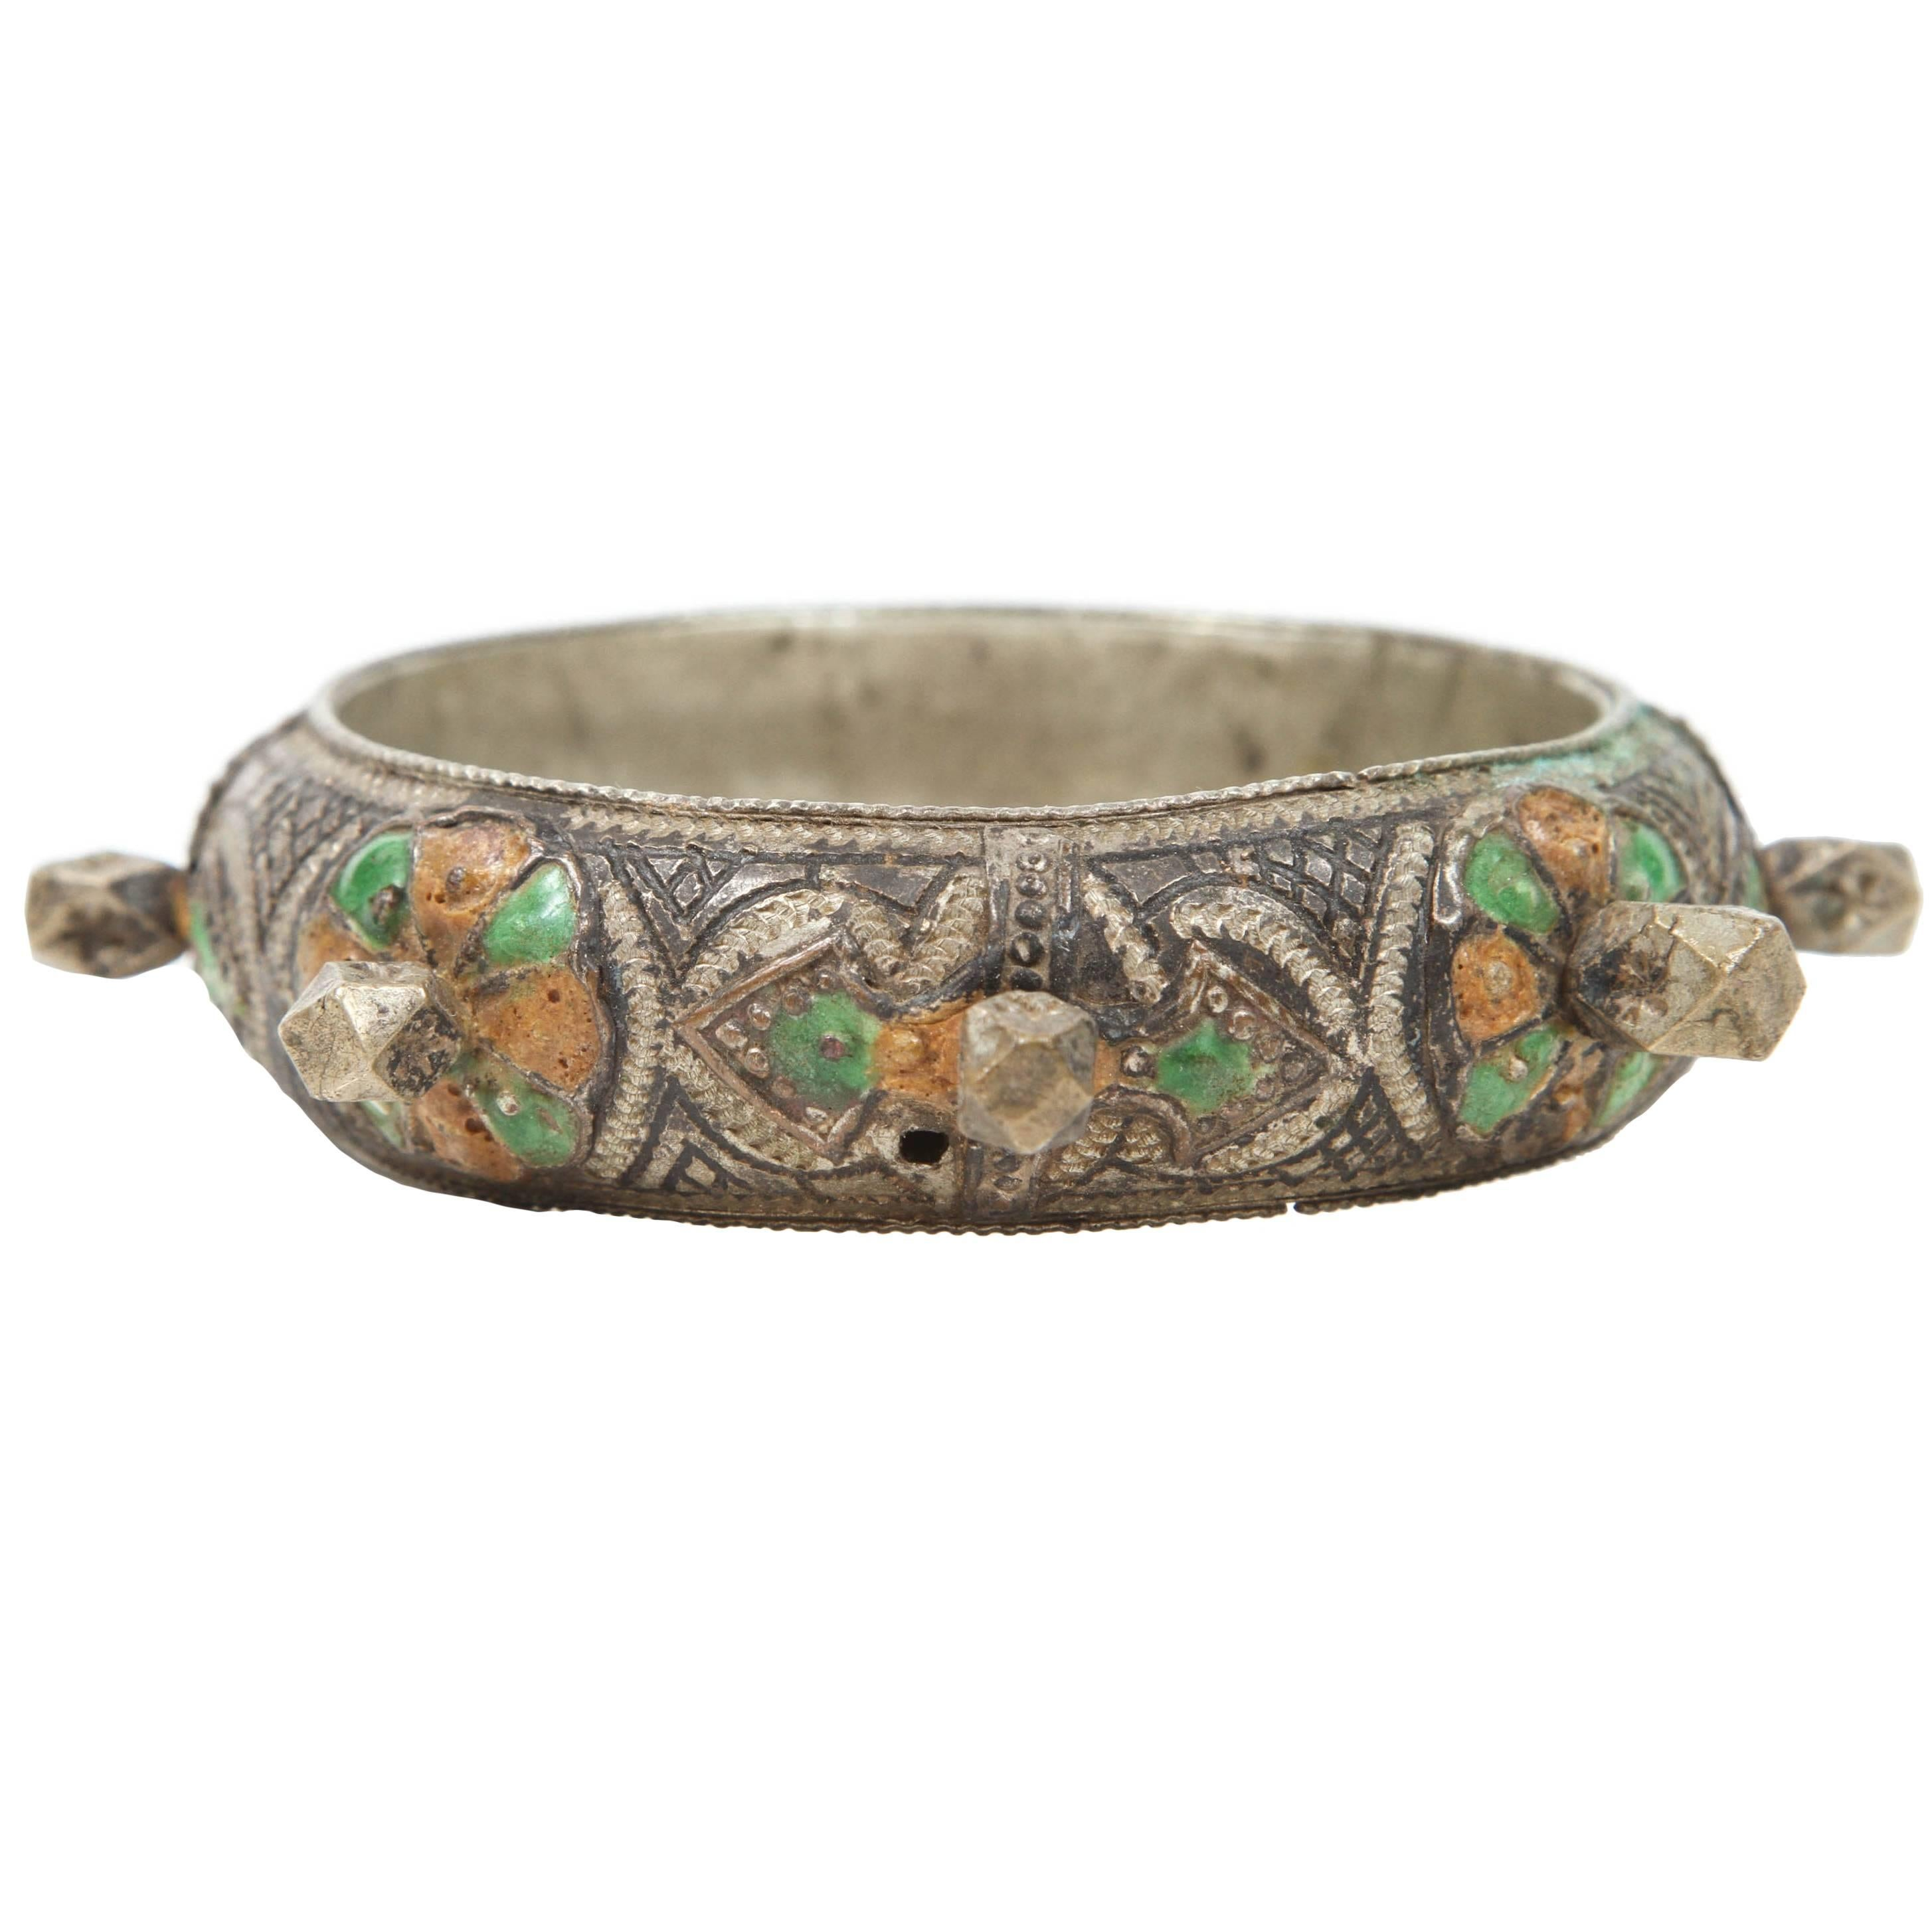 Moroccan Berber Silver Bracelet with Green and Orange Enamel